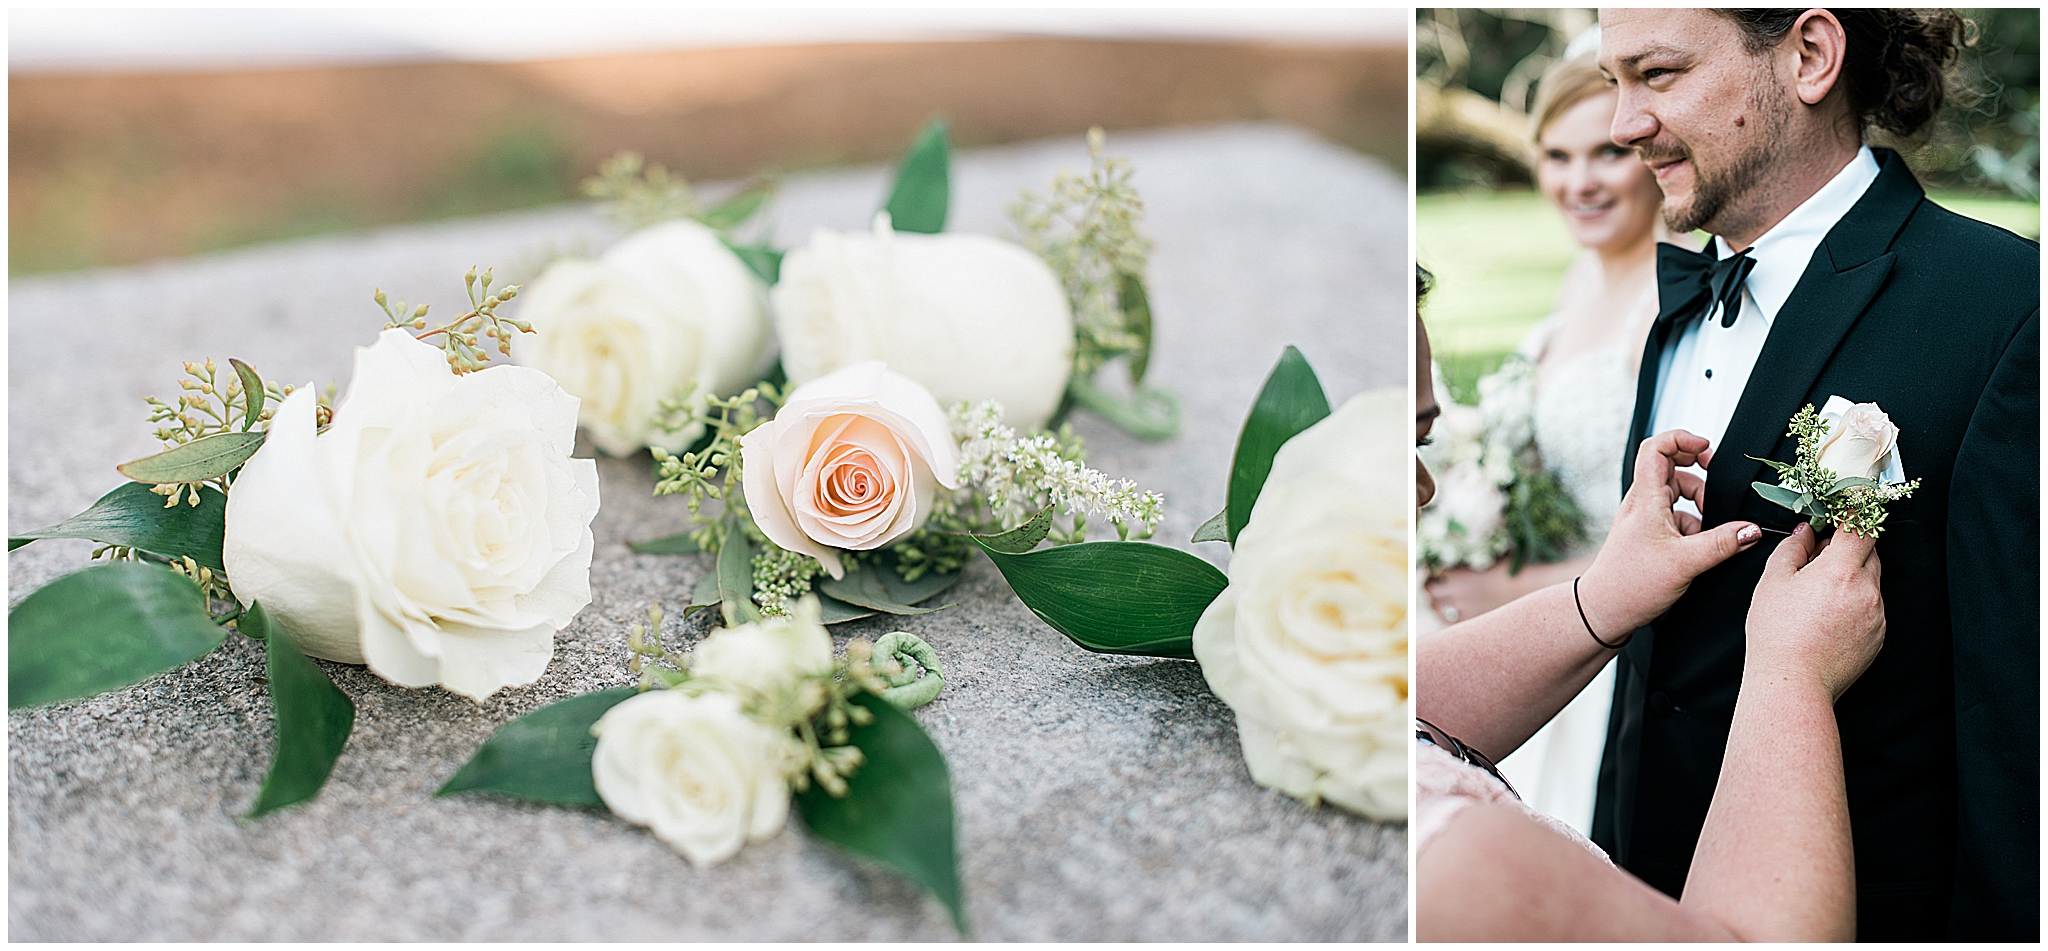 Wedding_Photographers_Asheville_Mountain_Magnolia_Inn_0012.jpg